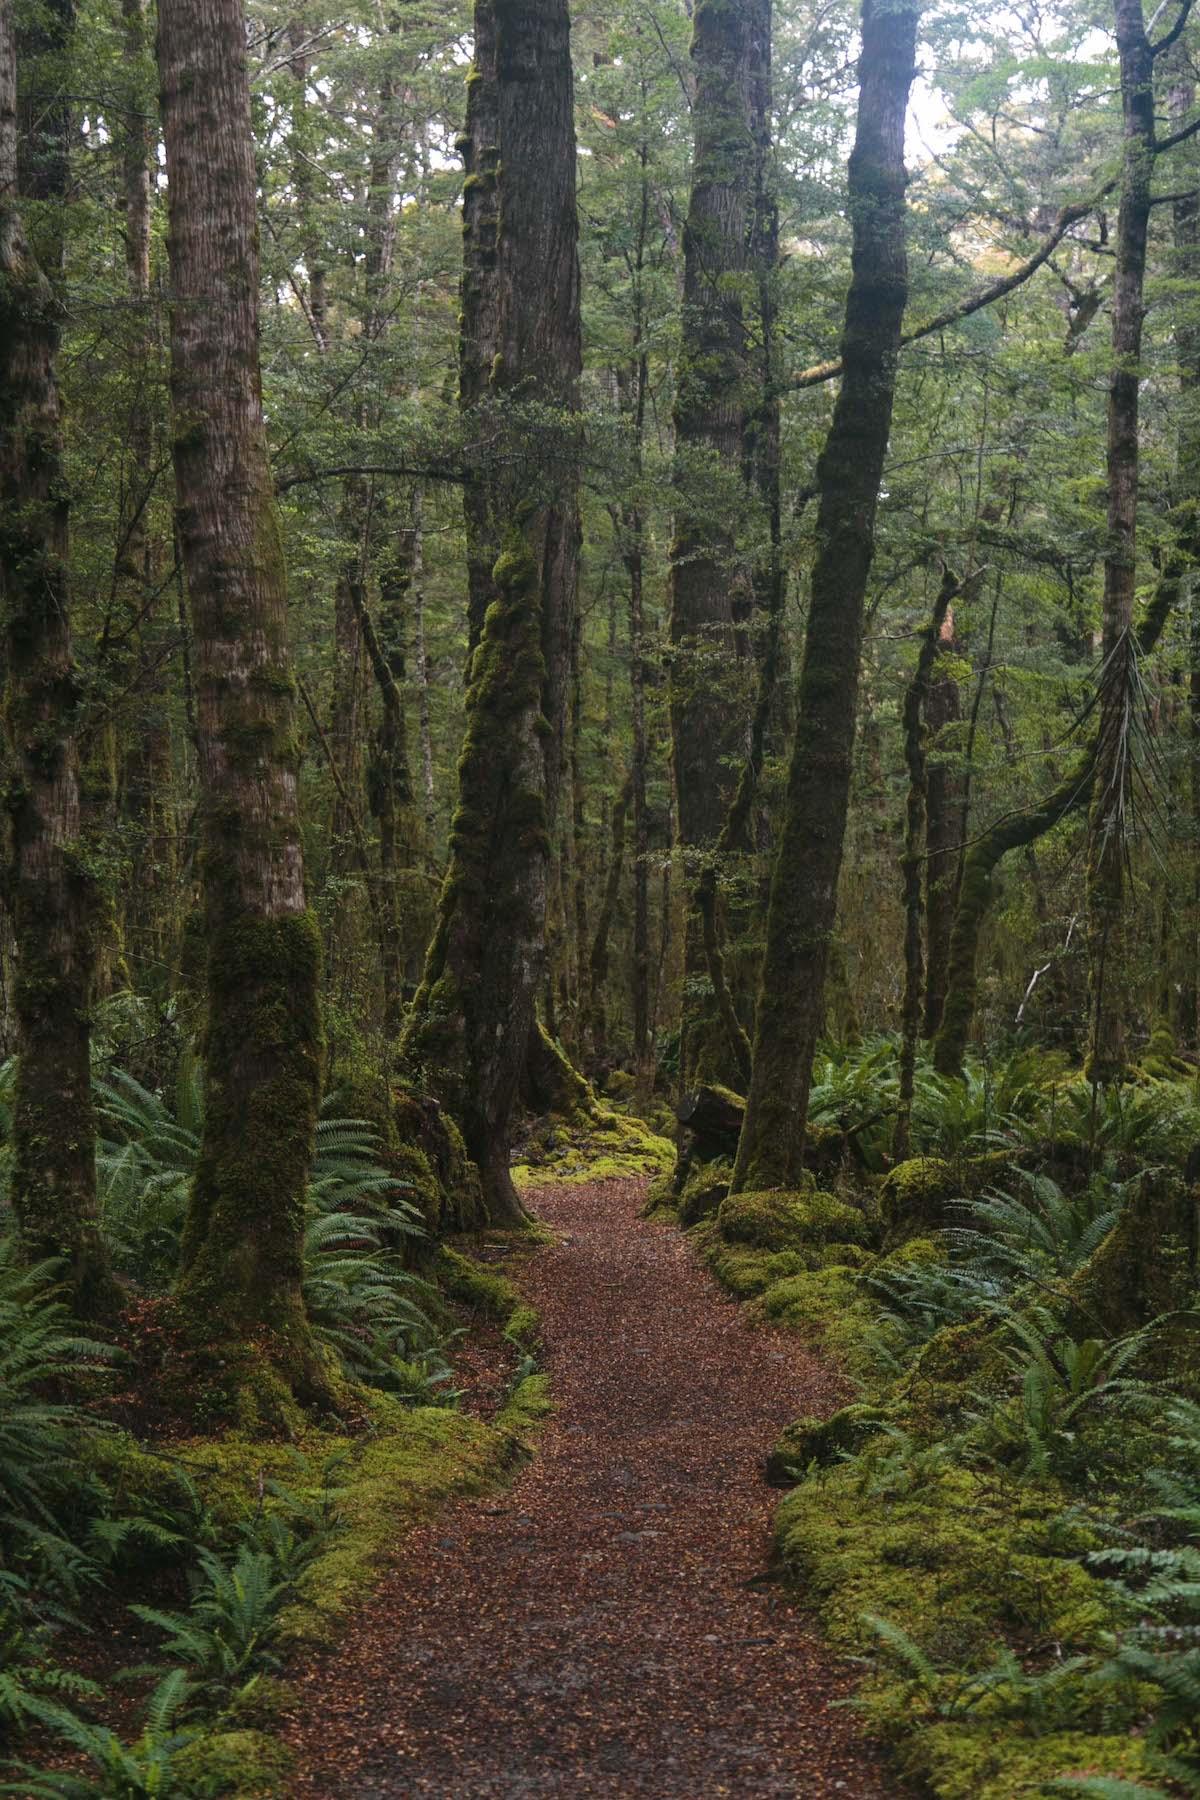 Lots of lush, fantastical goblin forests on the Kepler Track